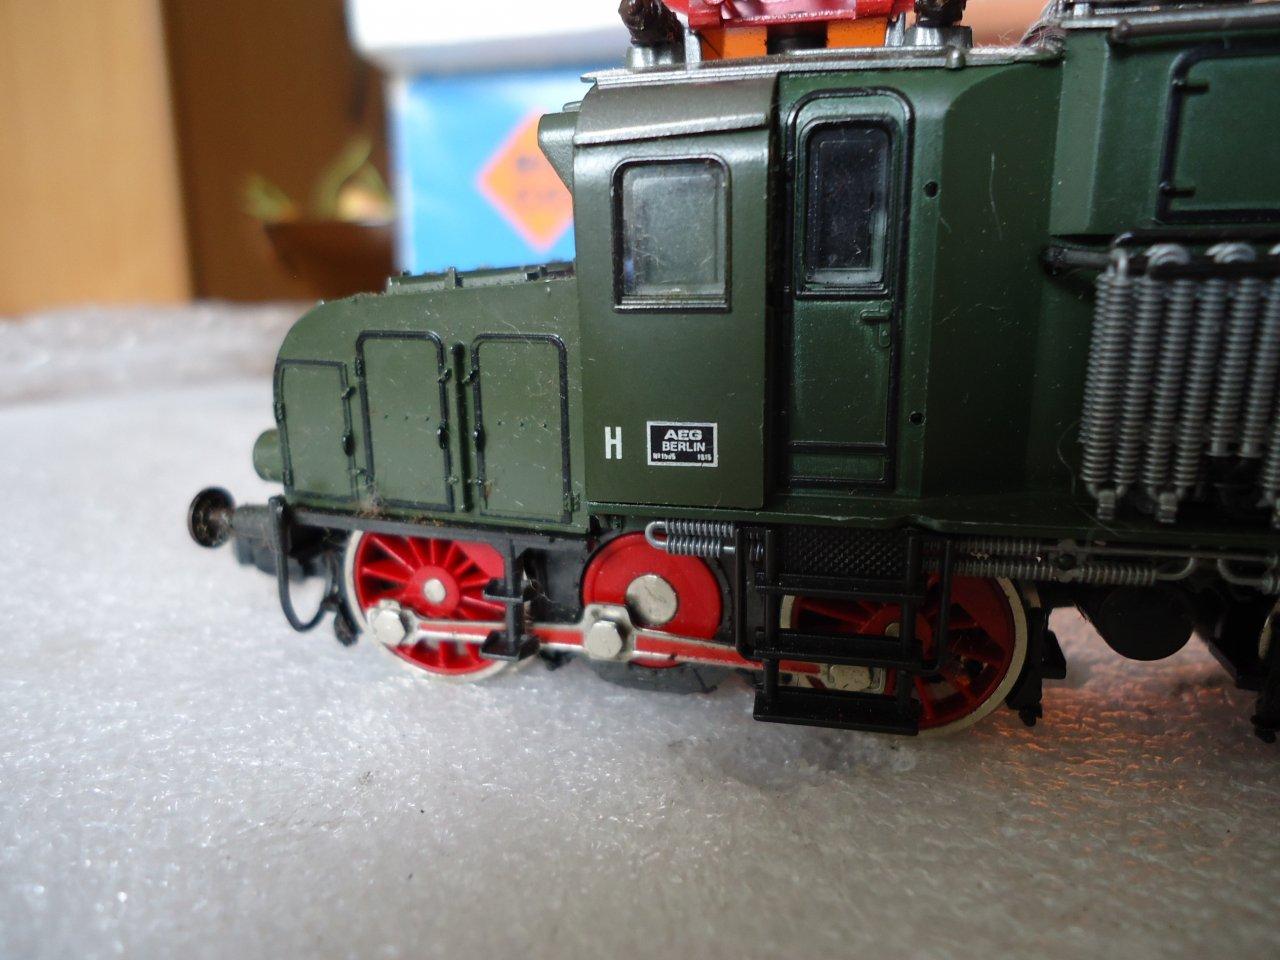 DSC00196.JPG